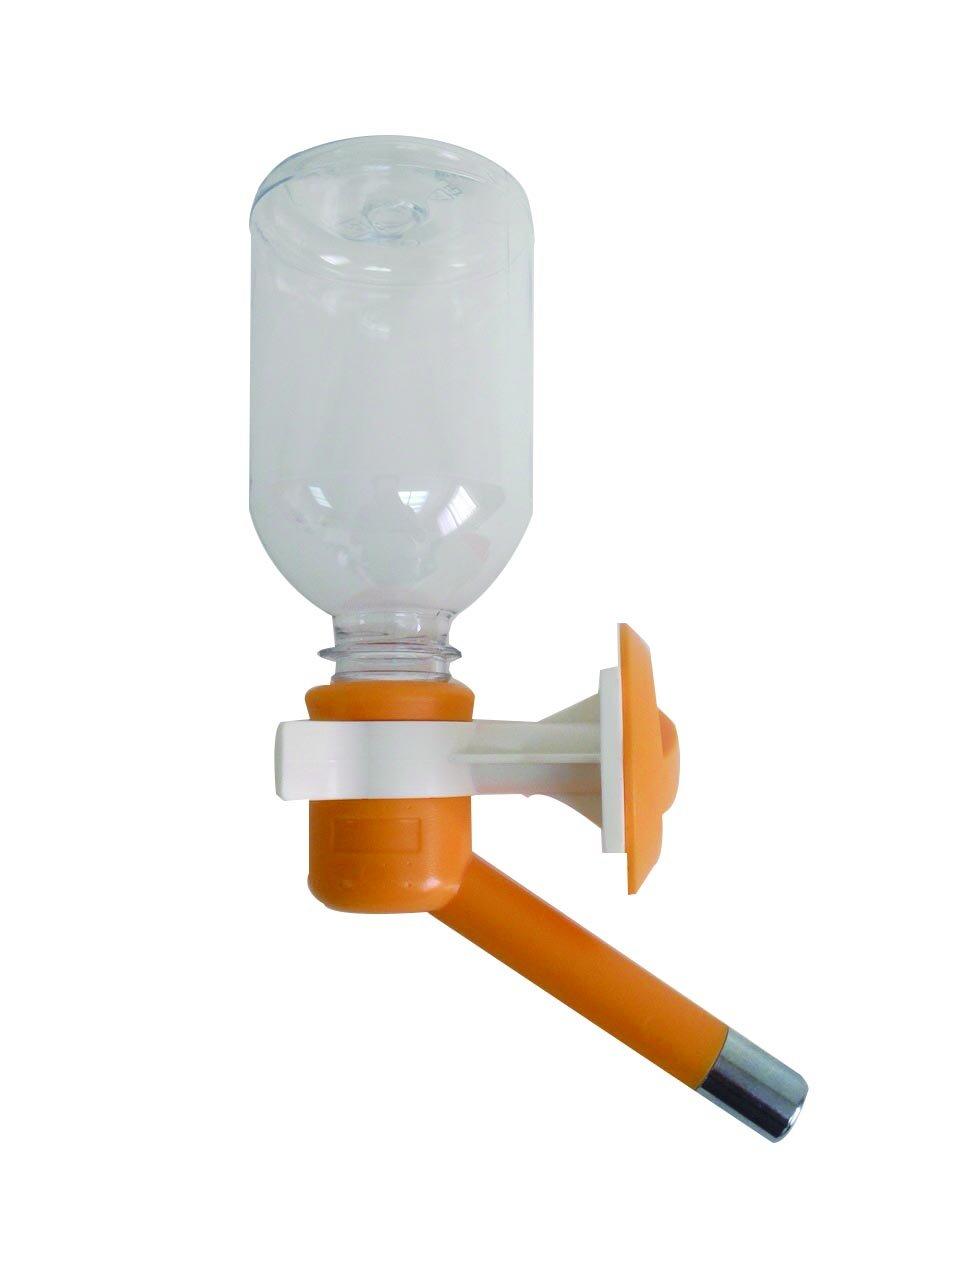 Choco Nose H590 Patented No Drip Small-Medium Sized Dog Water Bottle, Cat Water Feeder, Leak-Proof Pet Water Bottle, Mess-Free, 11.2 oz./330 mL, Nozzle Diameter, 16 mm, Orange